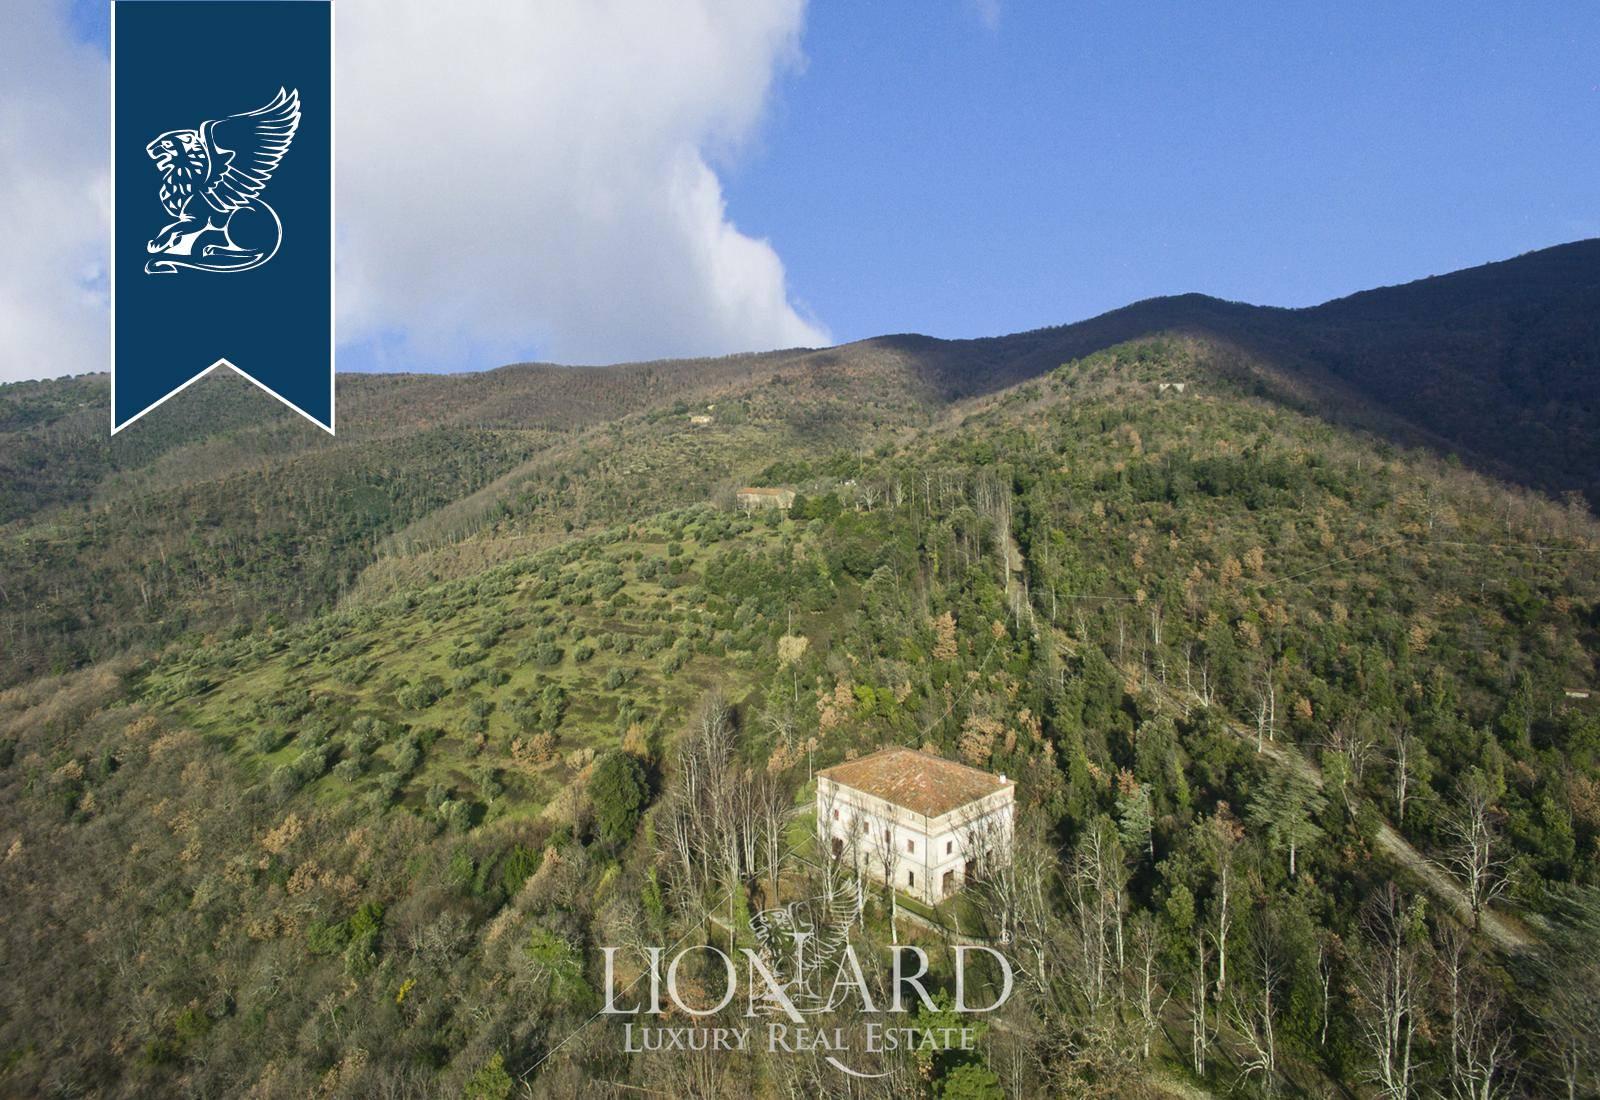 Azienda in Vendita a Montale: 0 locali, 4135 mq - Foto 9